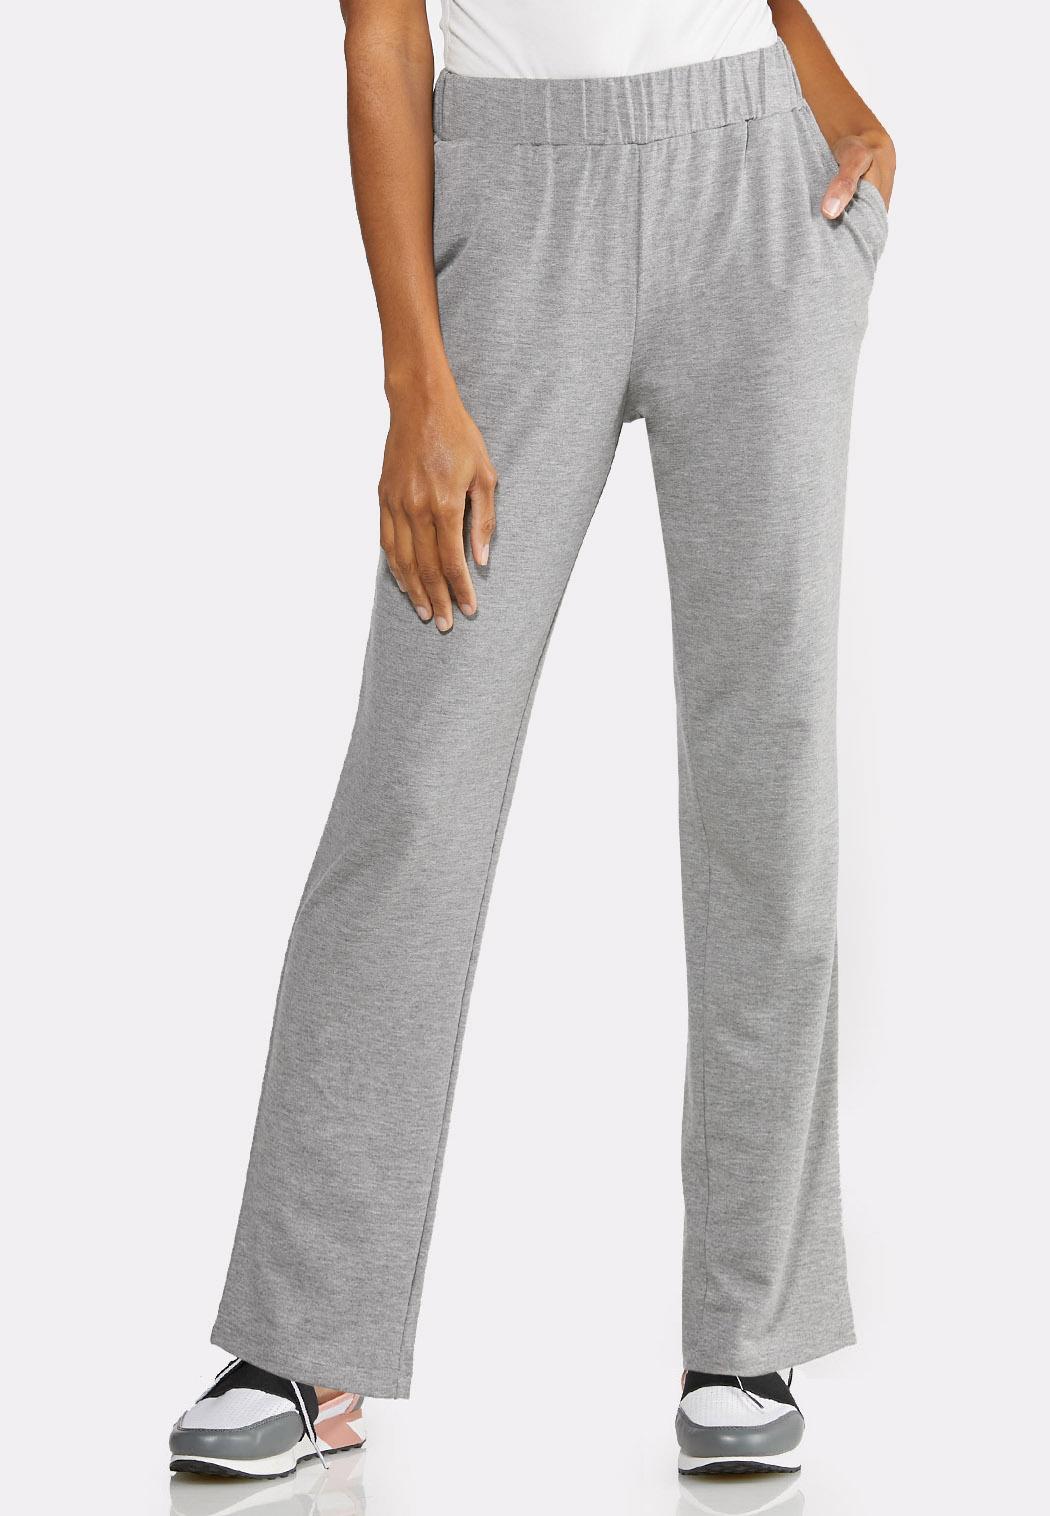 Gray Pull-On Pants